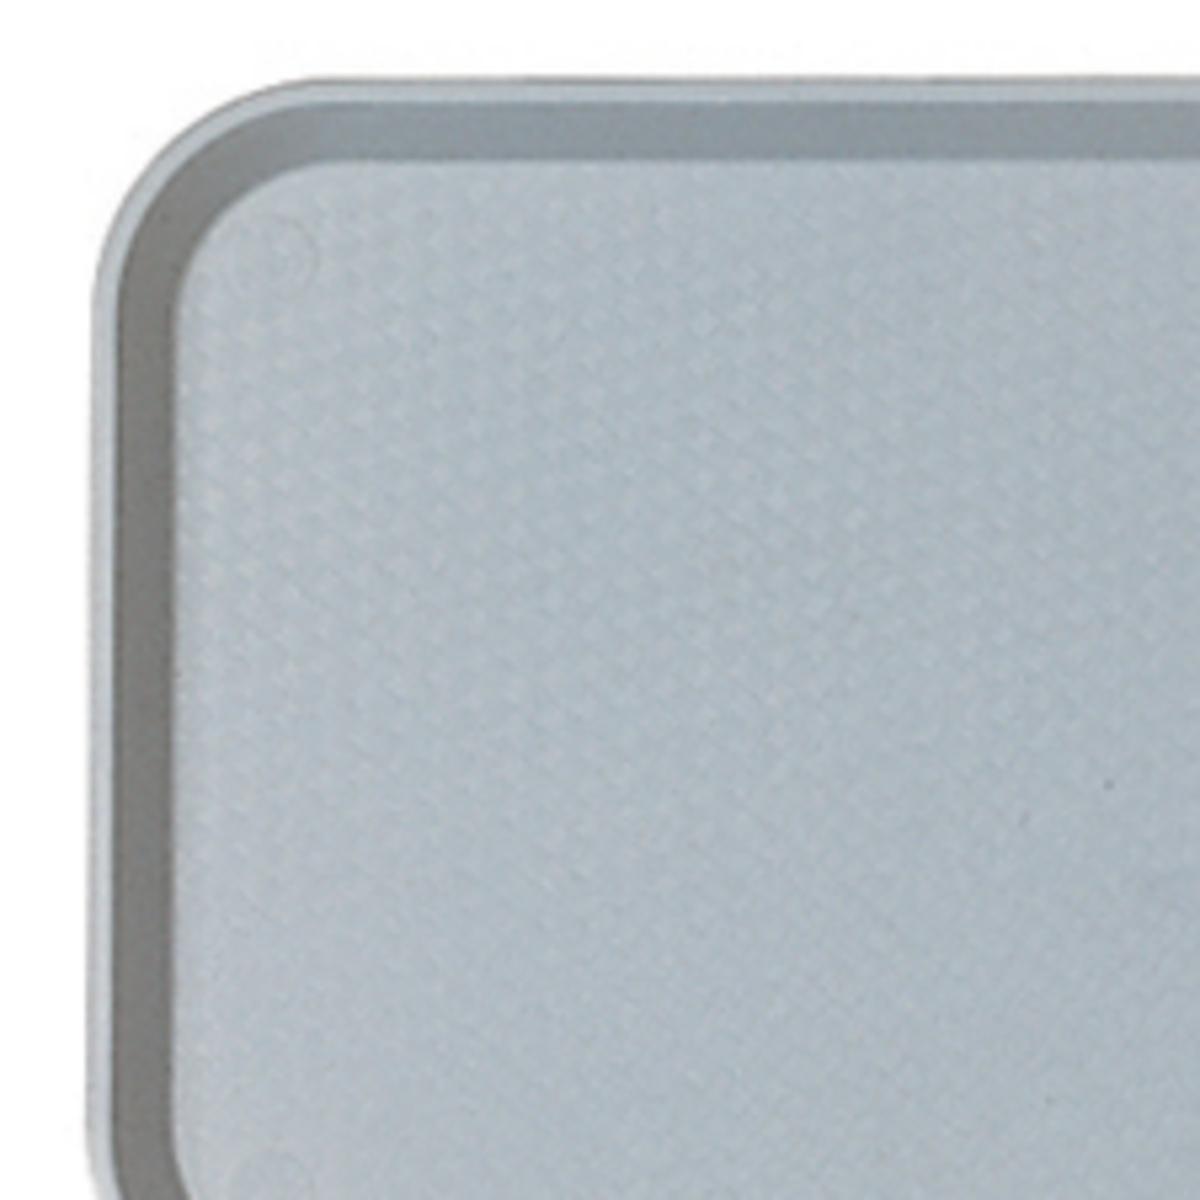 Plateau bleu plastique bord droit Fast Food Cambro